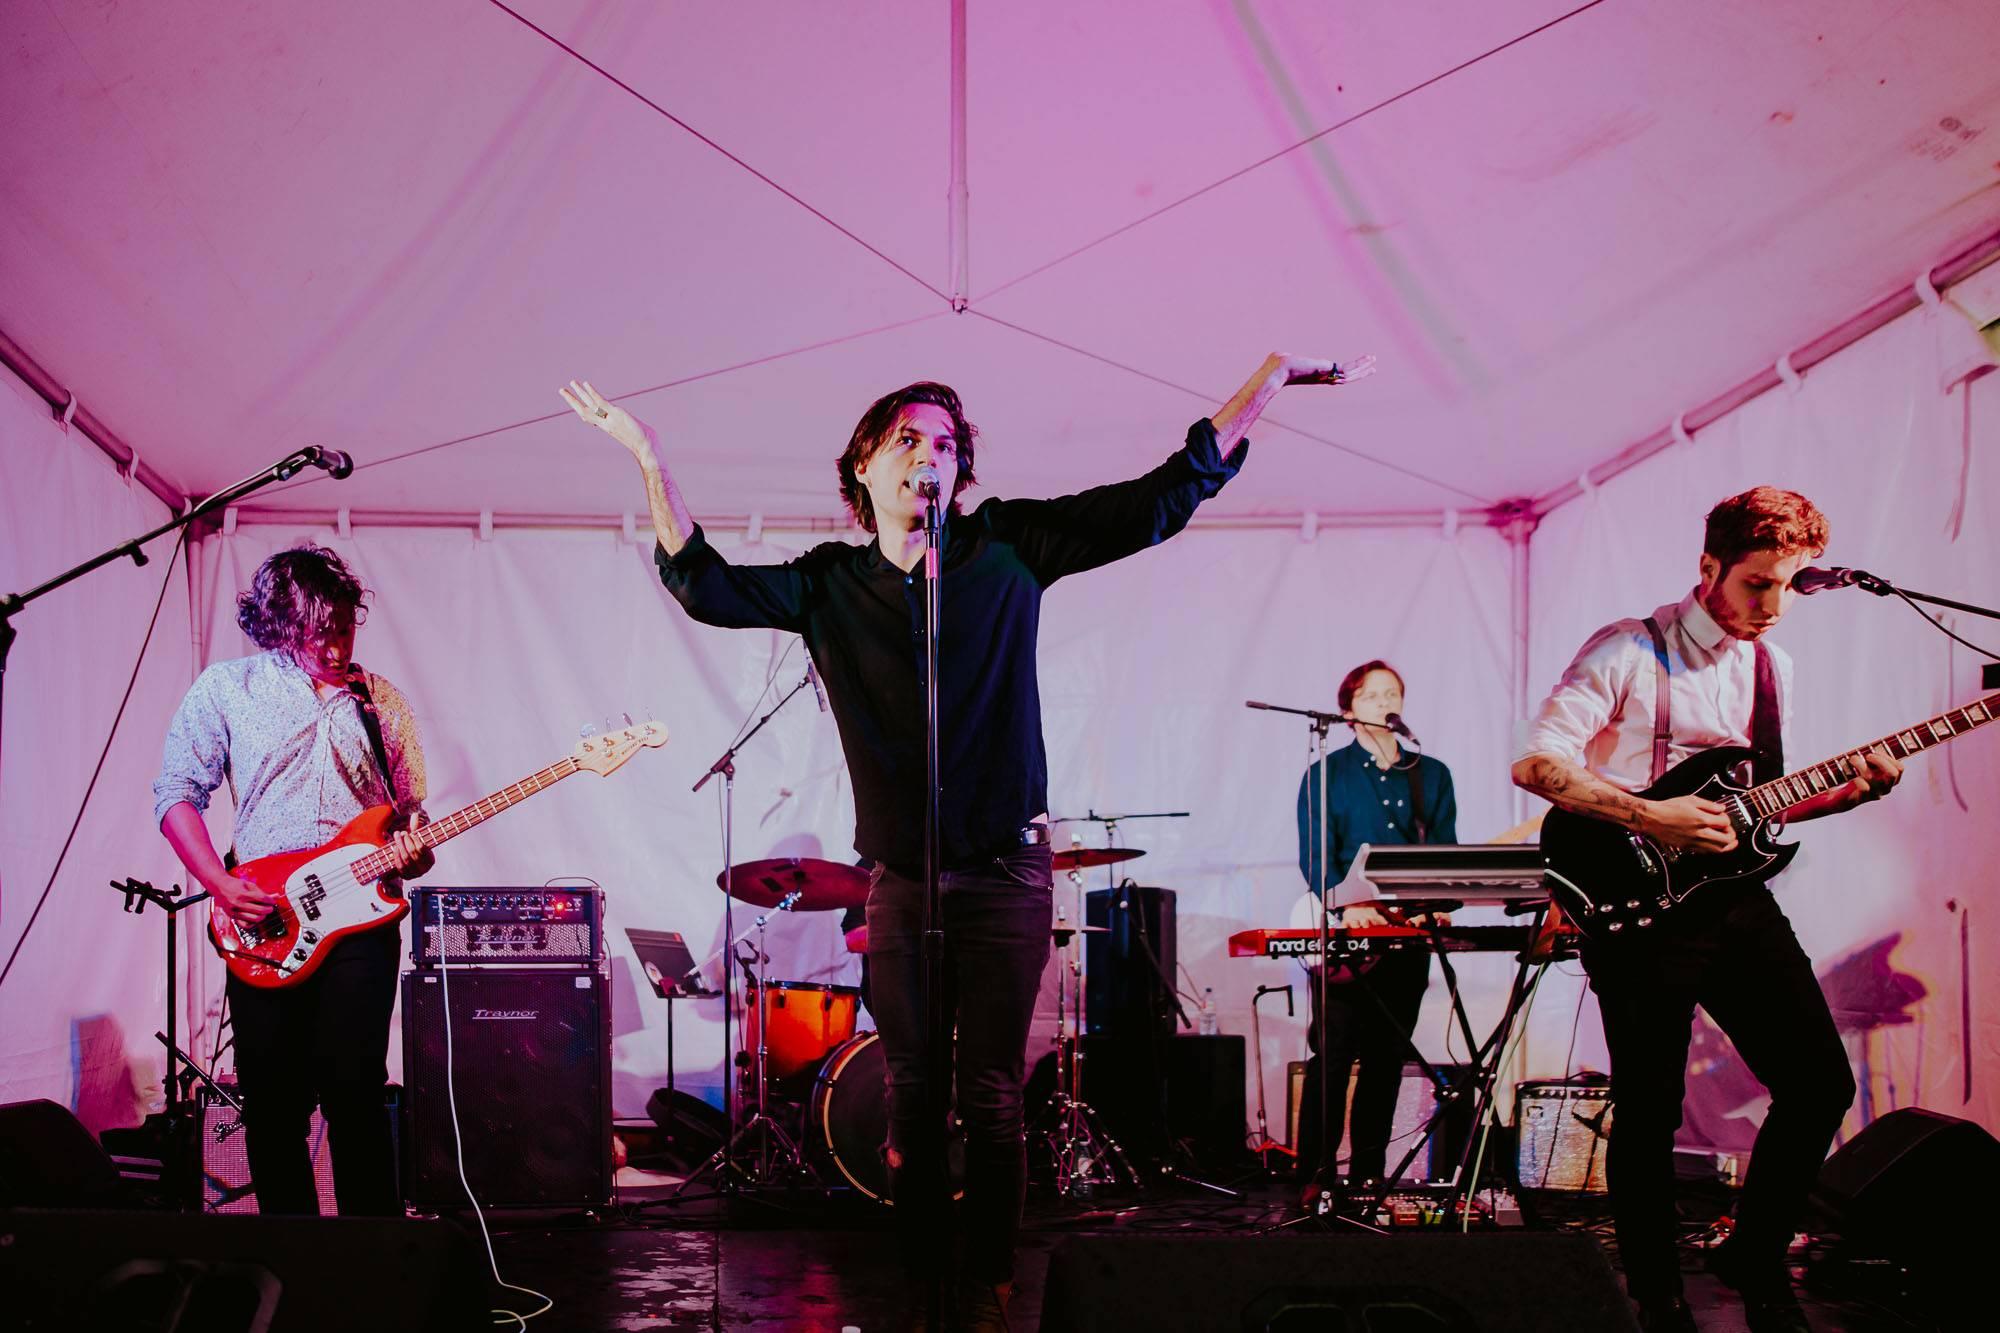 Yaletown Street Party at Westward Festival, Vancouver, Sep 14 2019. Kelli Anne photo.